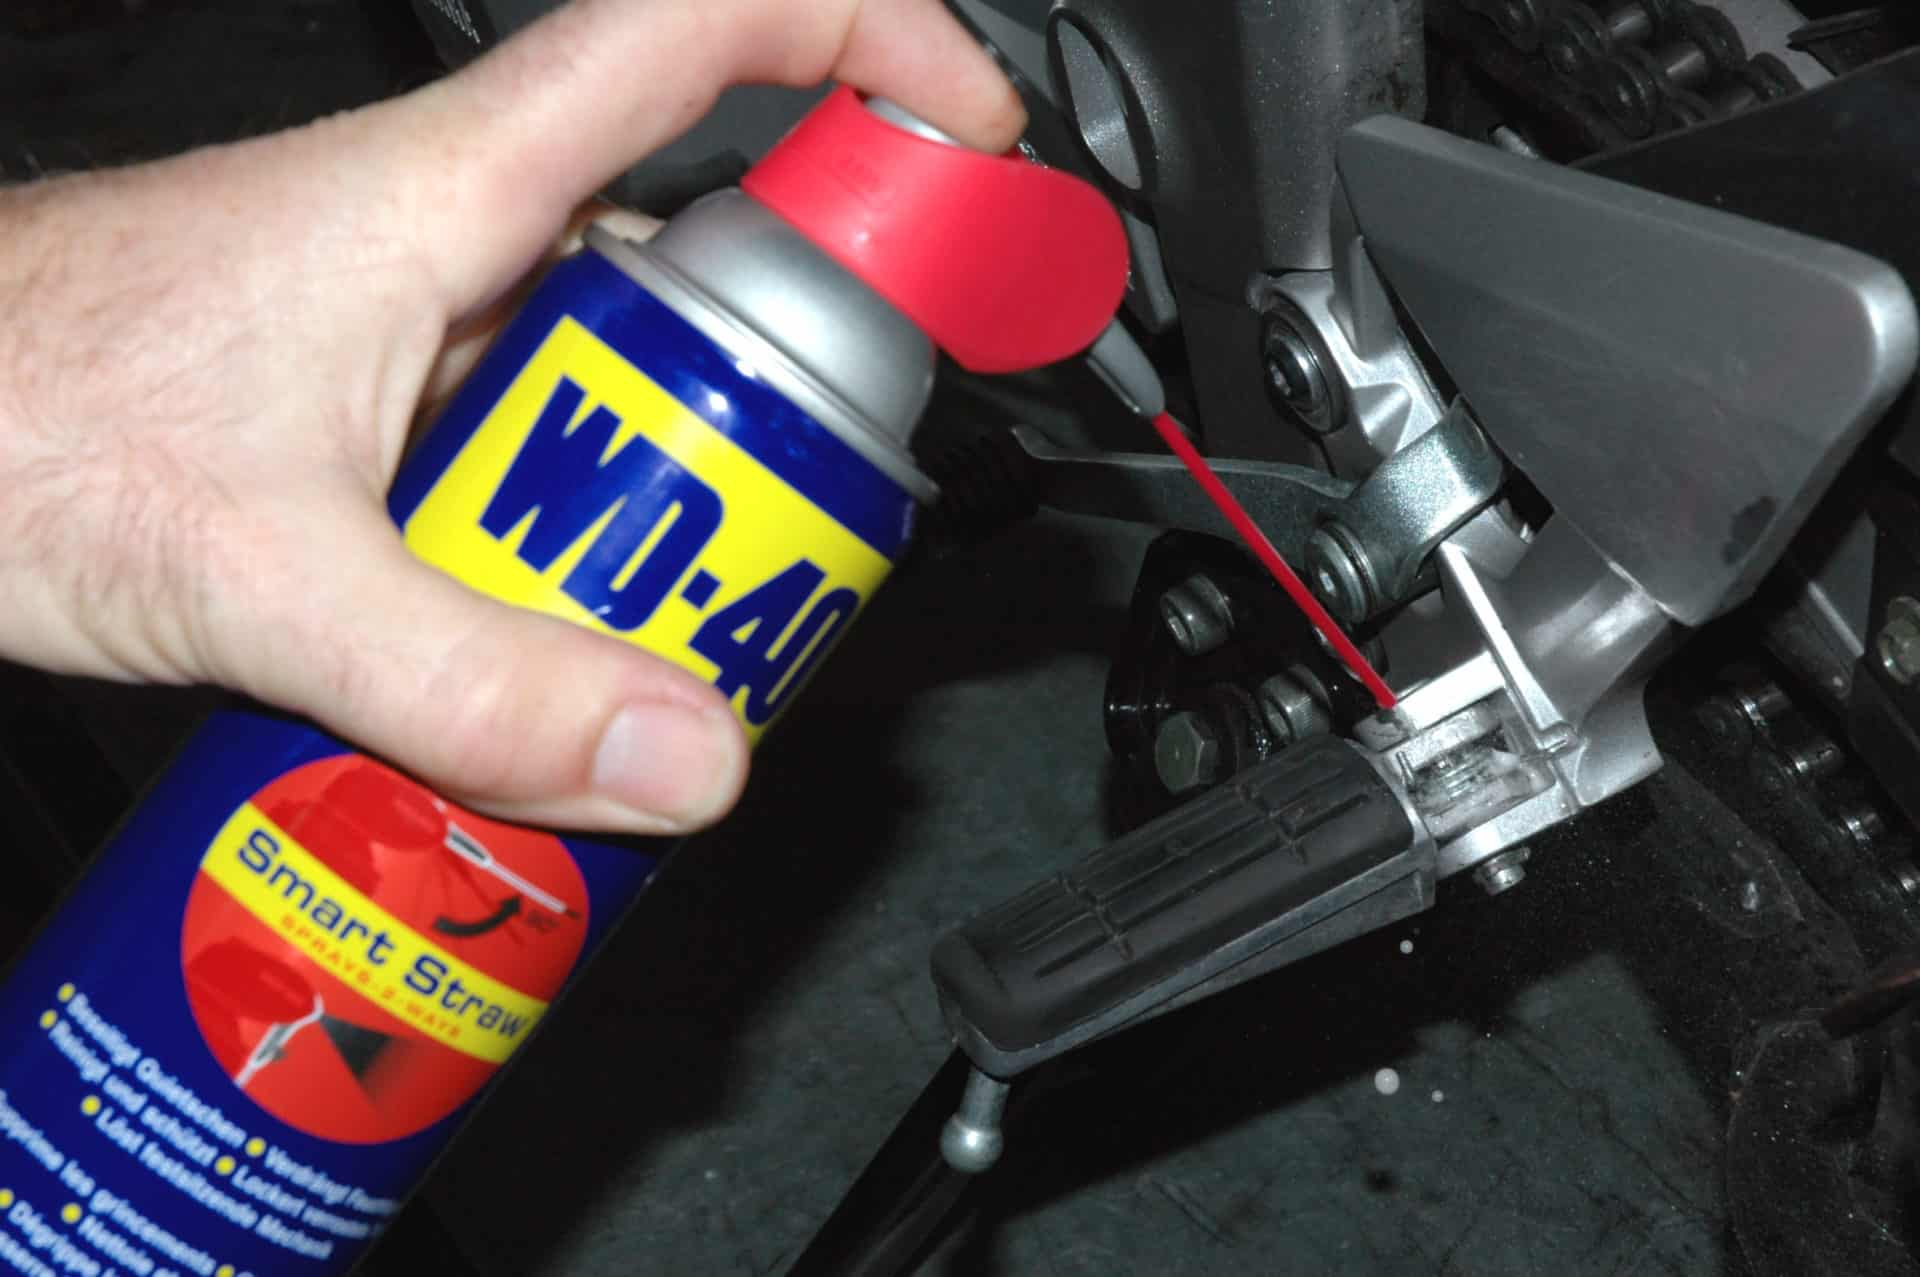 Motorrad reparieren - Der WD-40 Guide